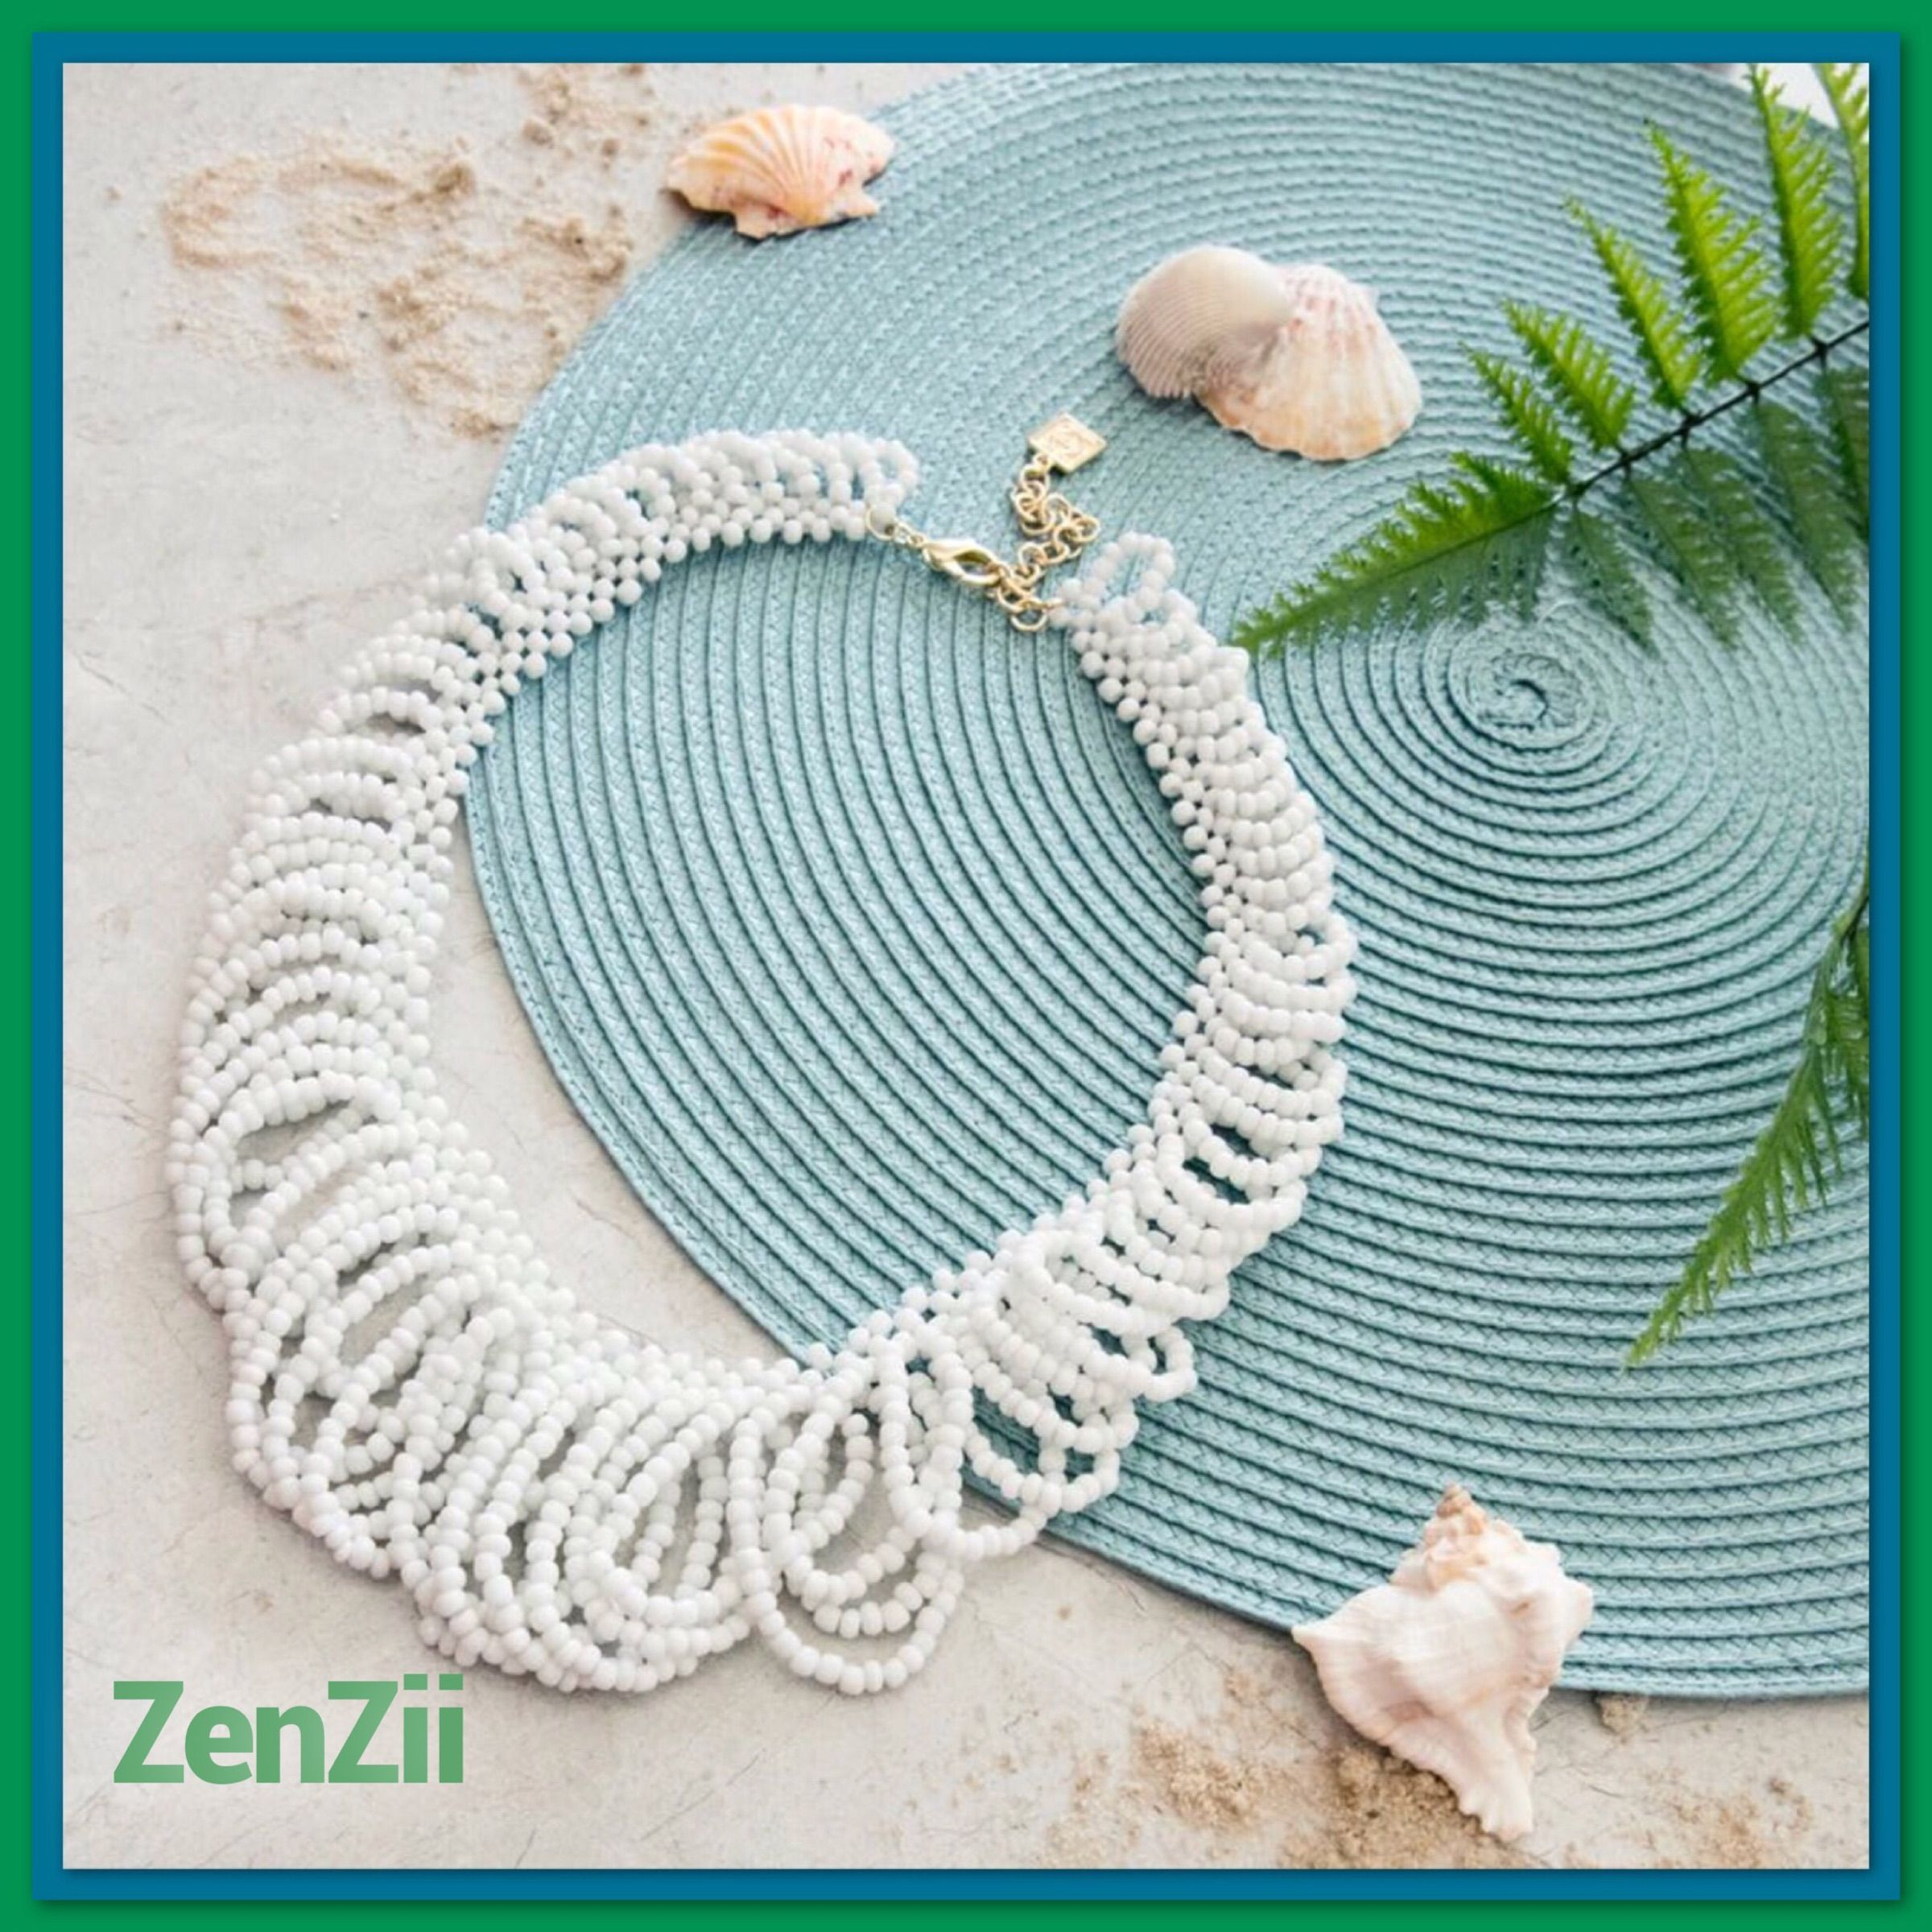 This ZenZii jewelery is Perfect for Summer! ZenZii